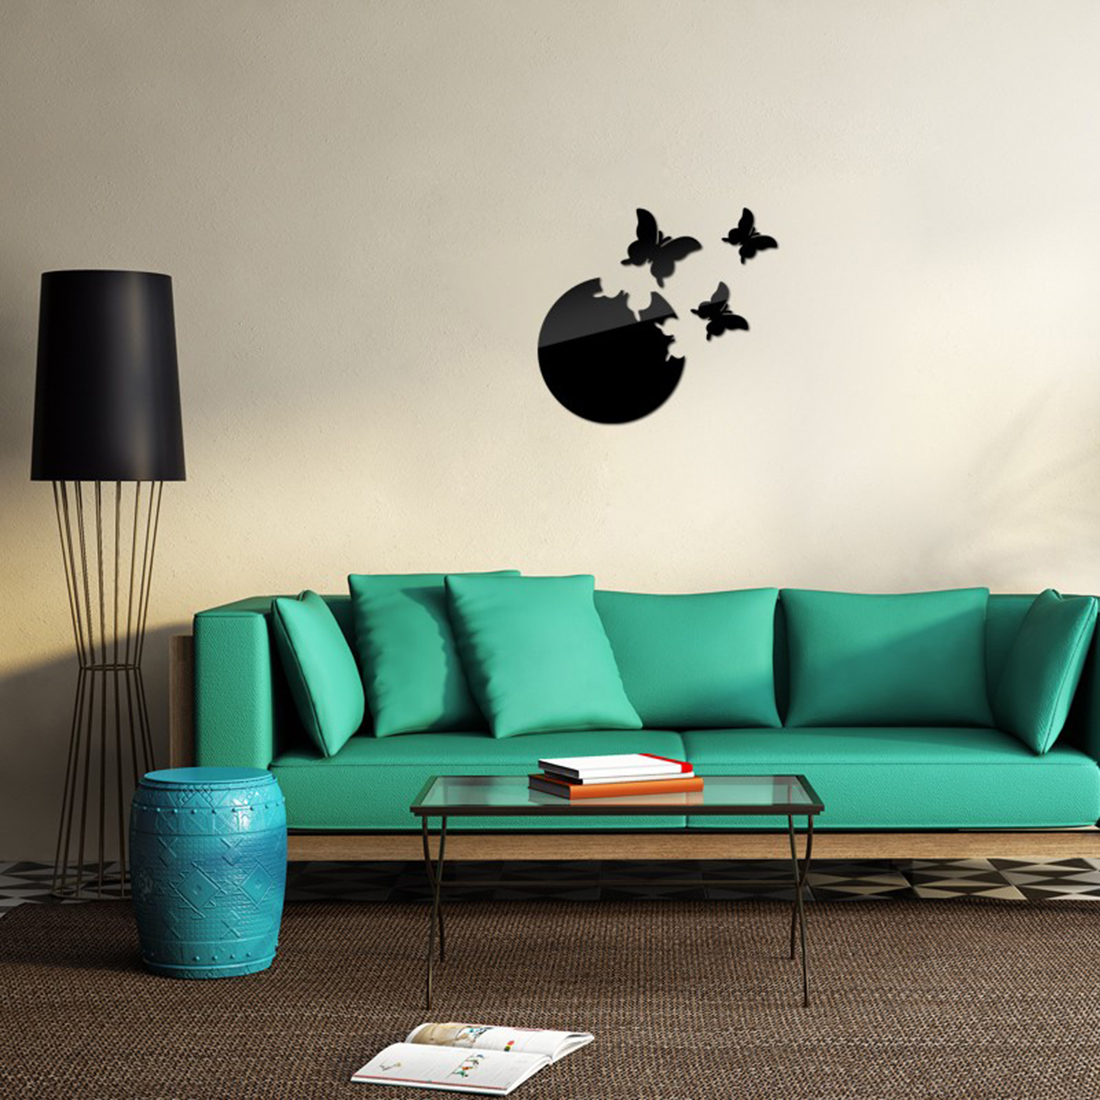 2016 Home Decor Wall Sticker Stickers Diy Kitchen Acrylic Mirror ...